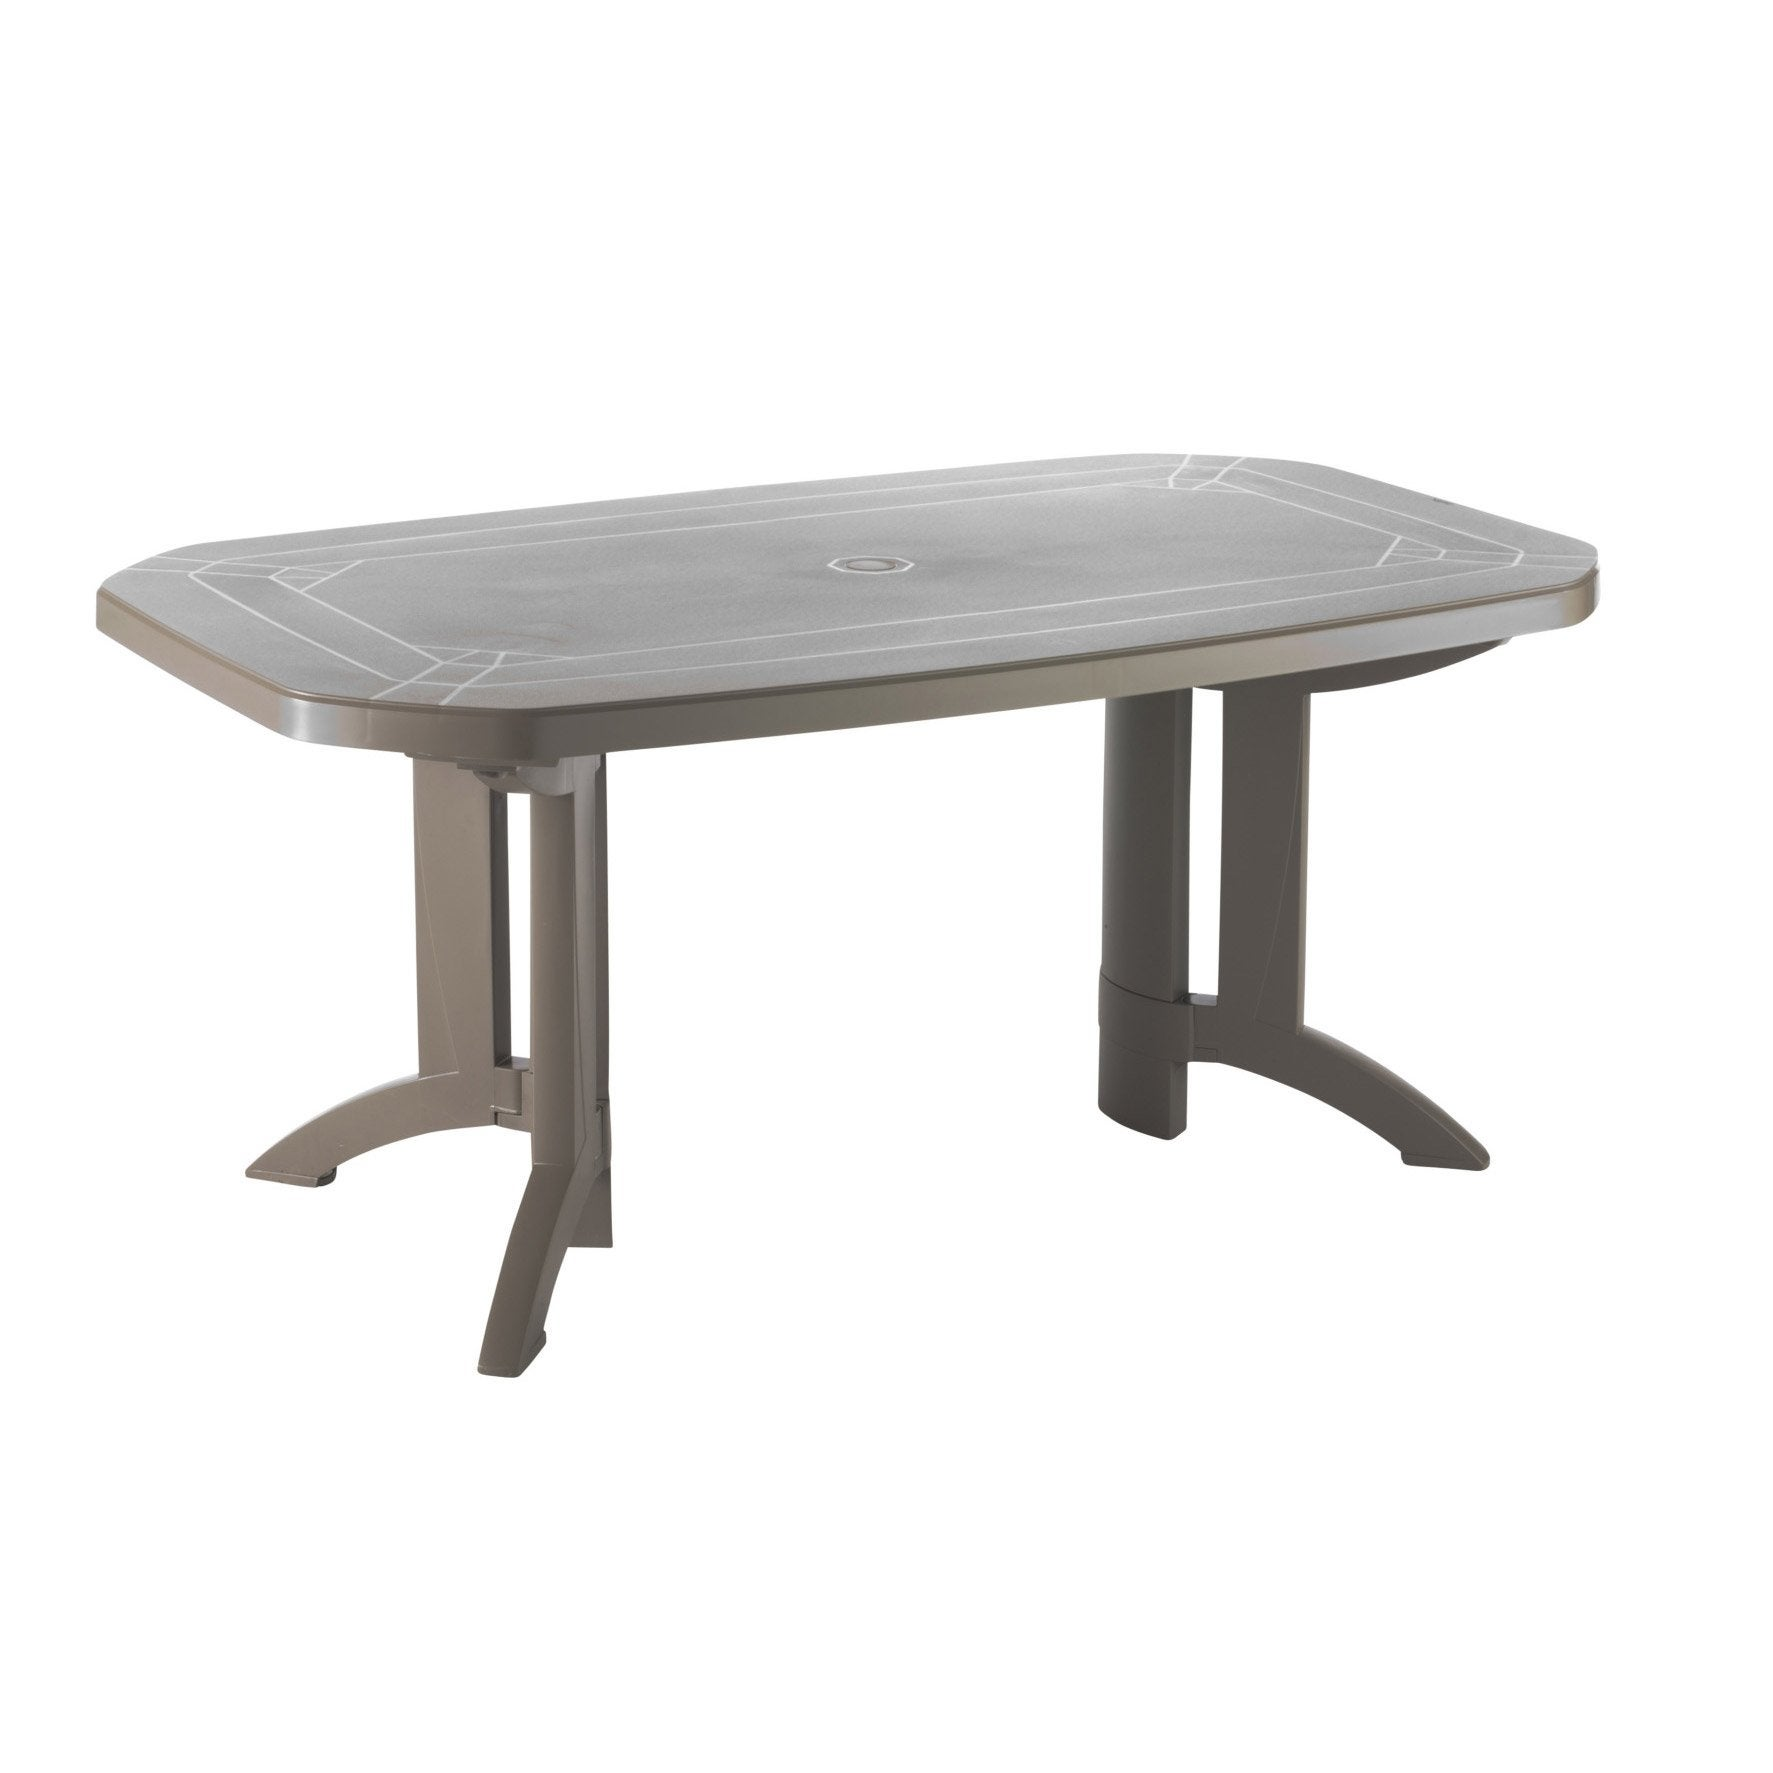 Table De Jardin De Repas Grosfillex Vega Rectangulaire Taupe 8